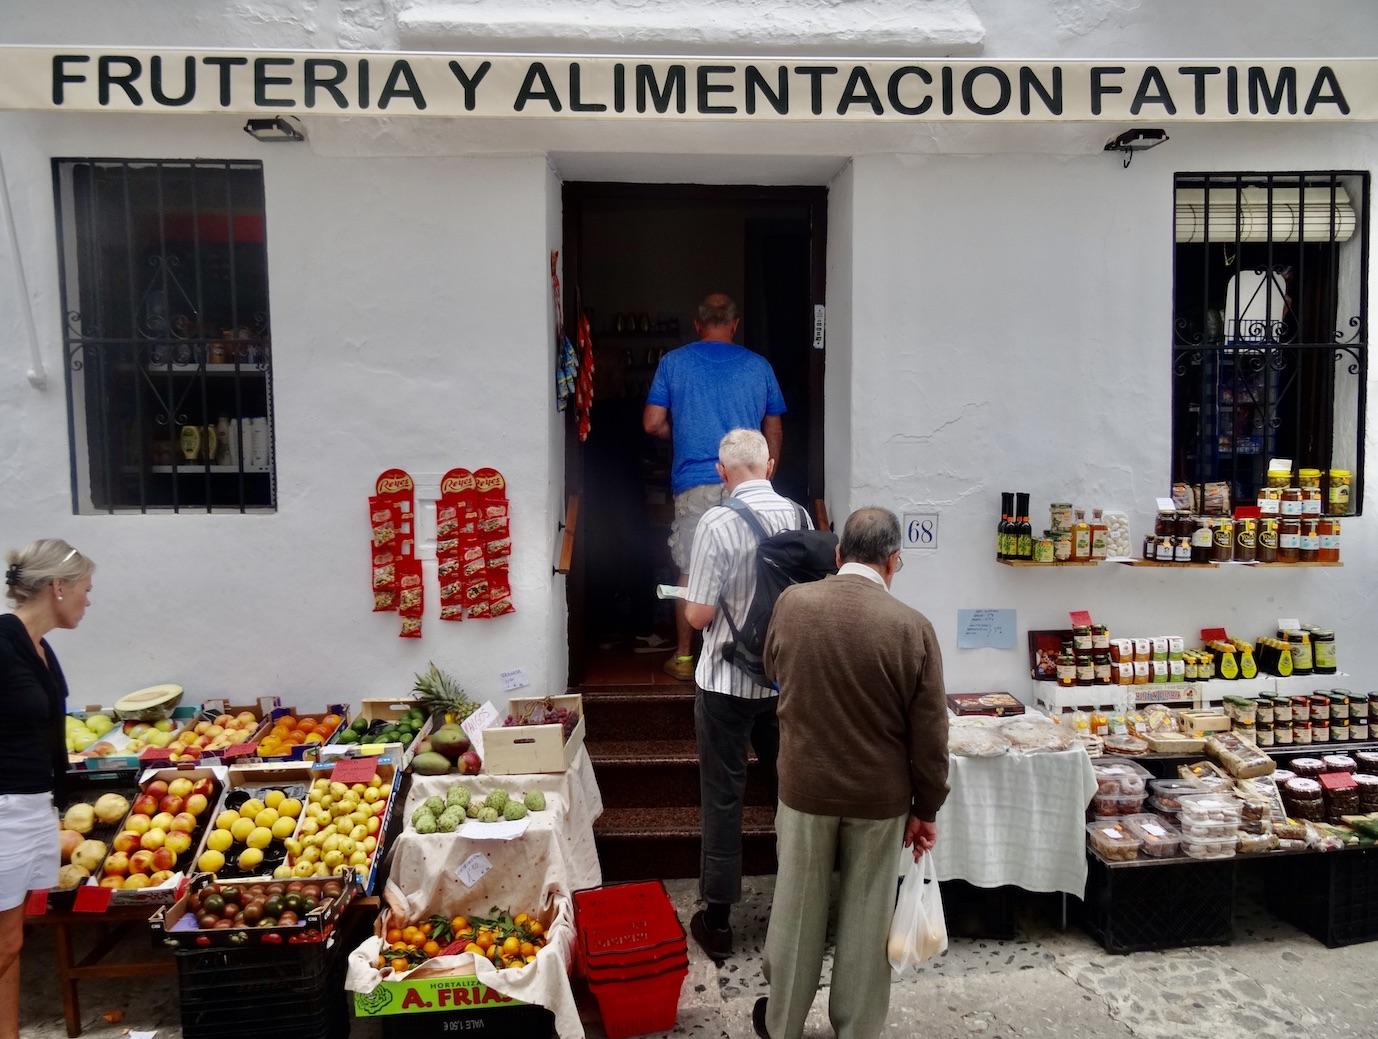 Fruit and veg store Frigiliana Spain.